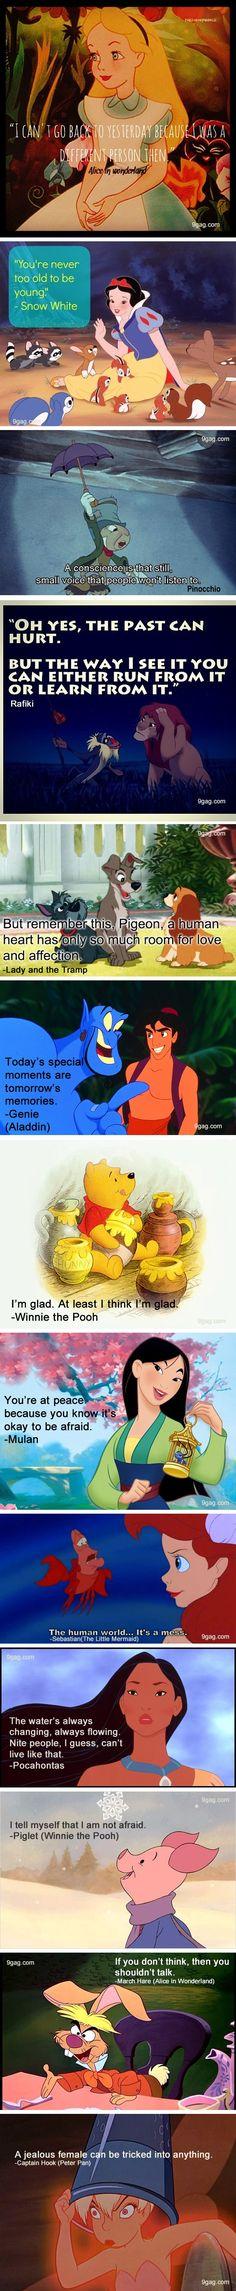 Shockingly Profound Disney Movies Quotes